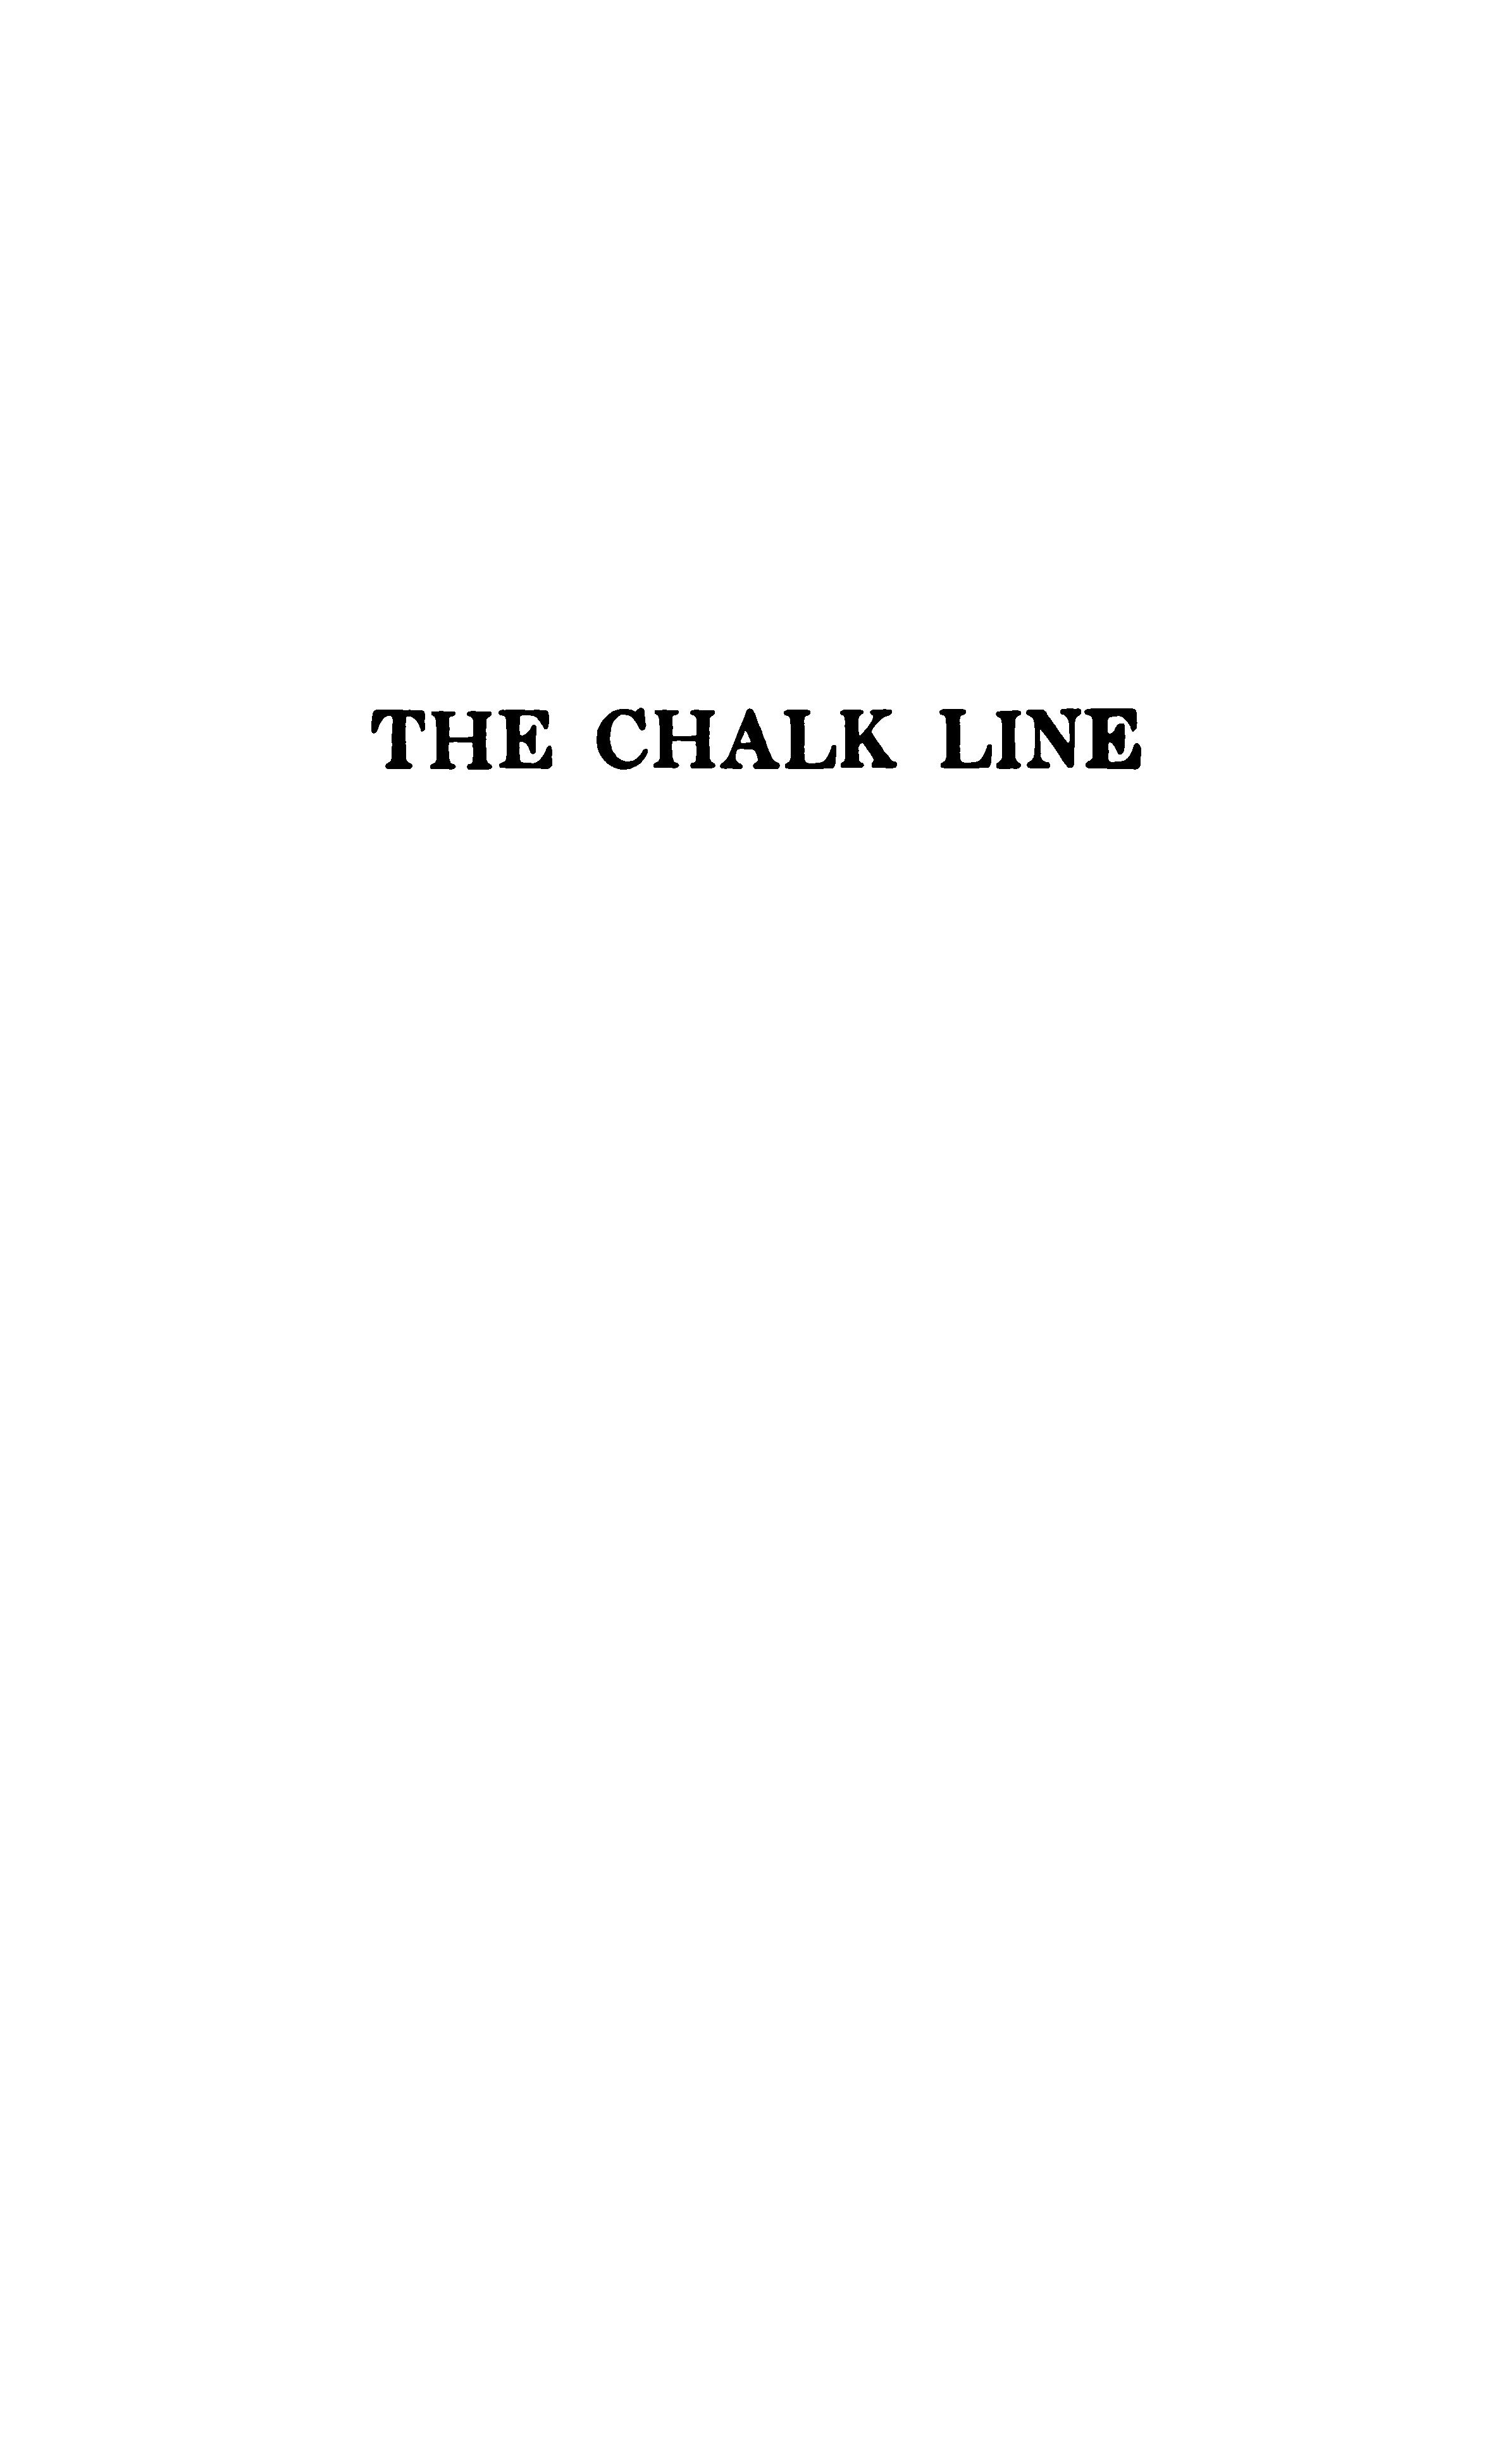 White Chalk Line Png.